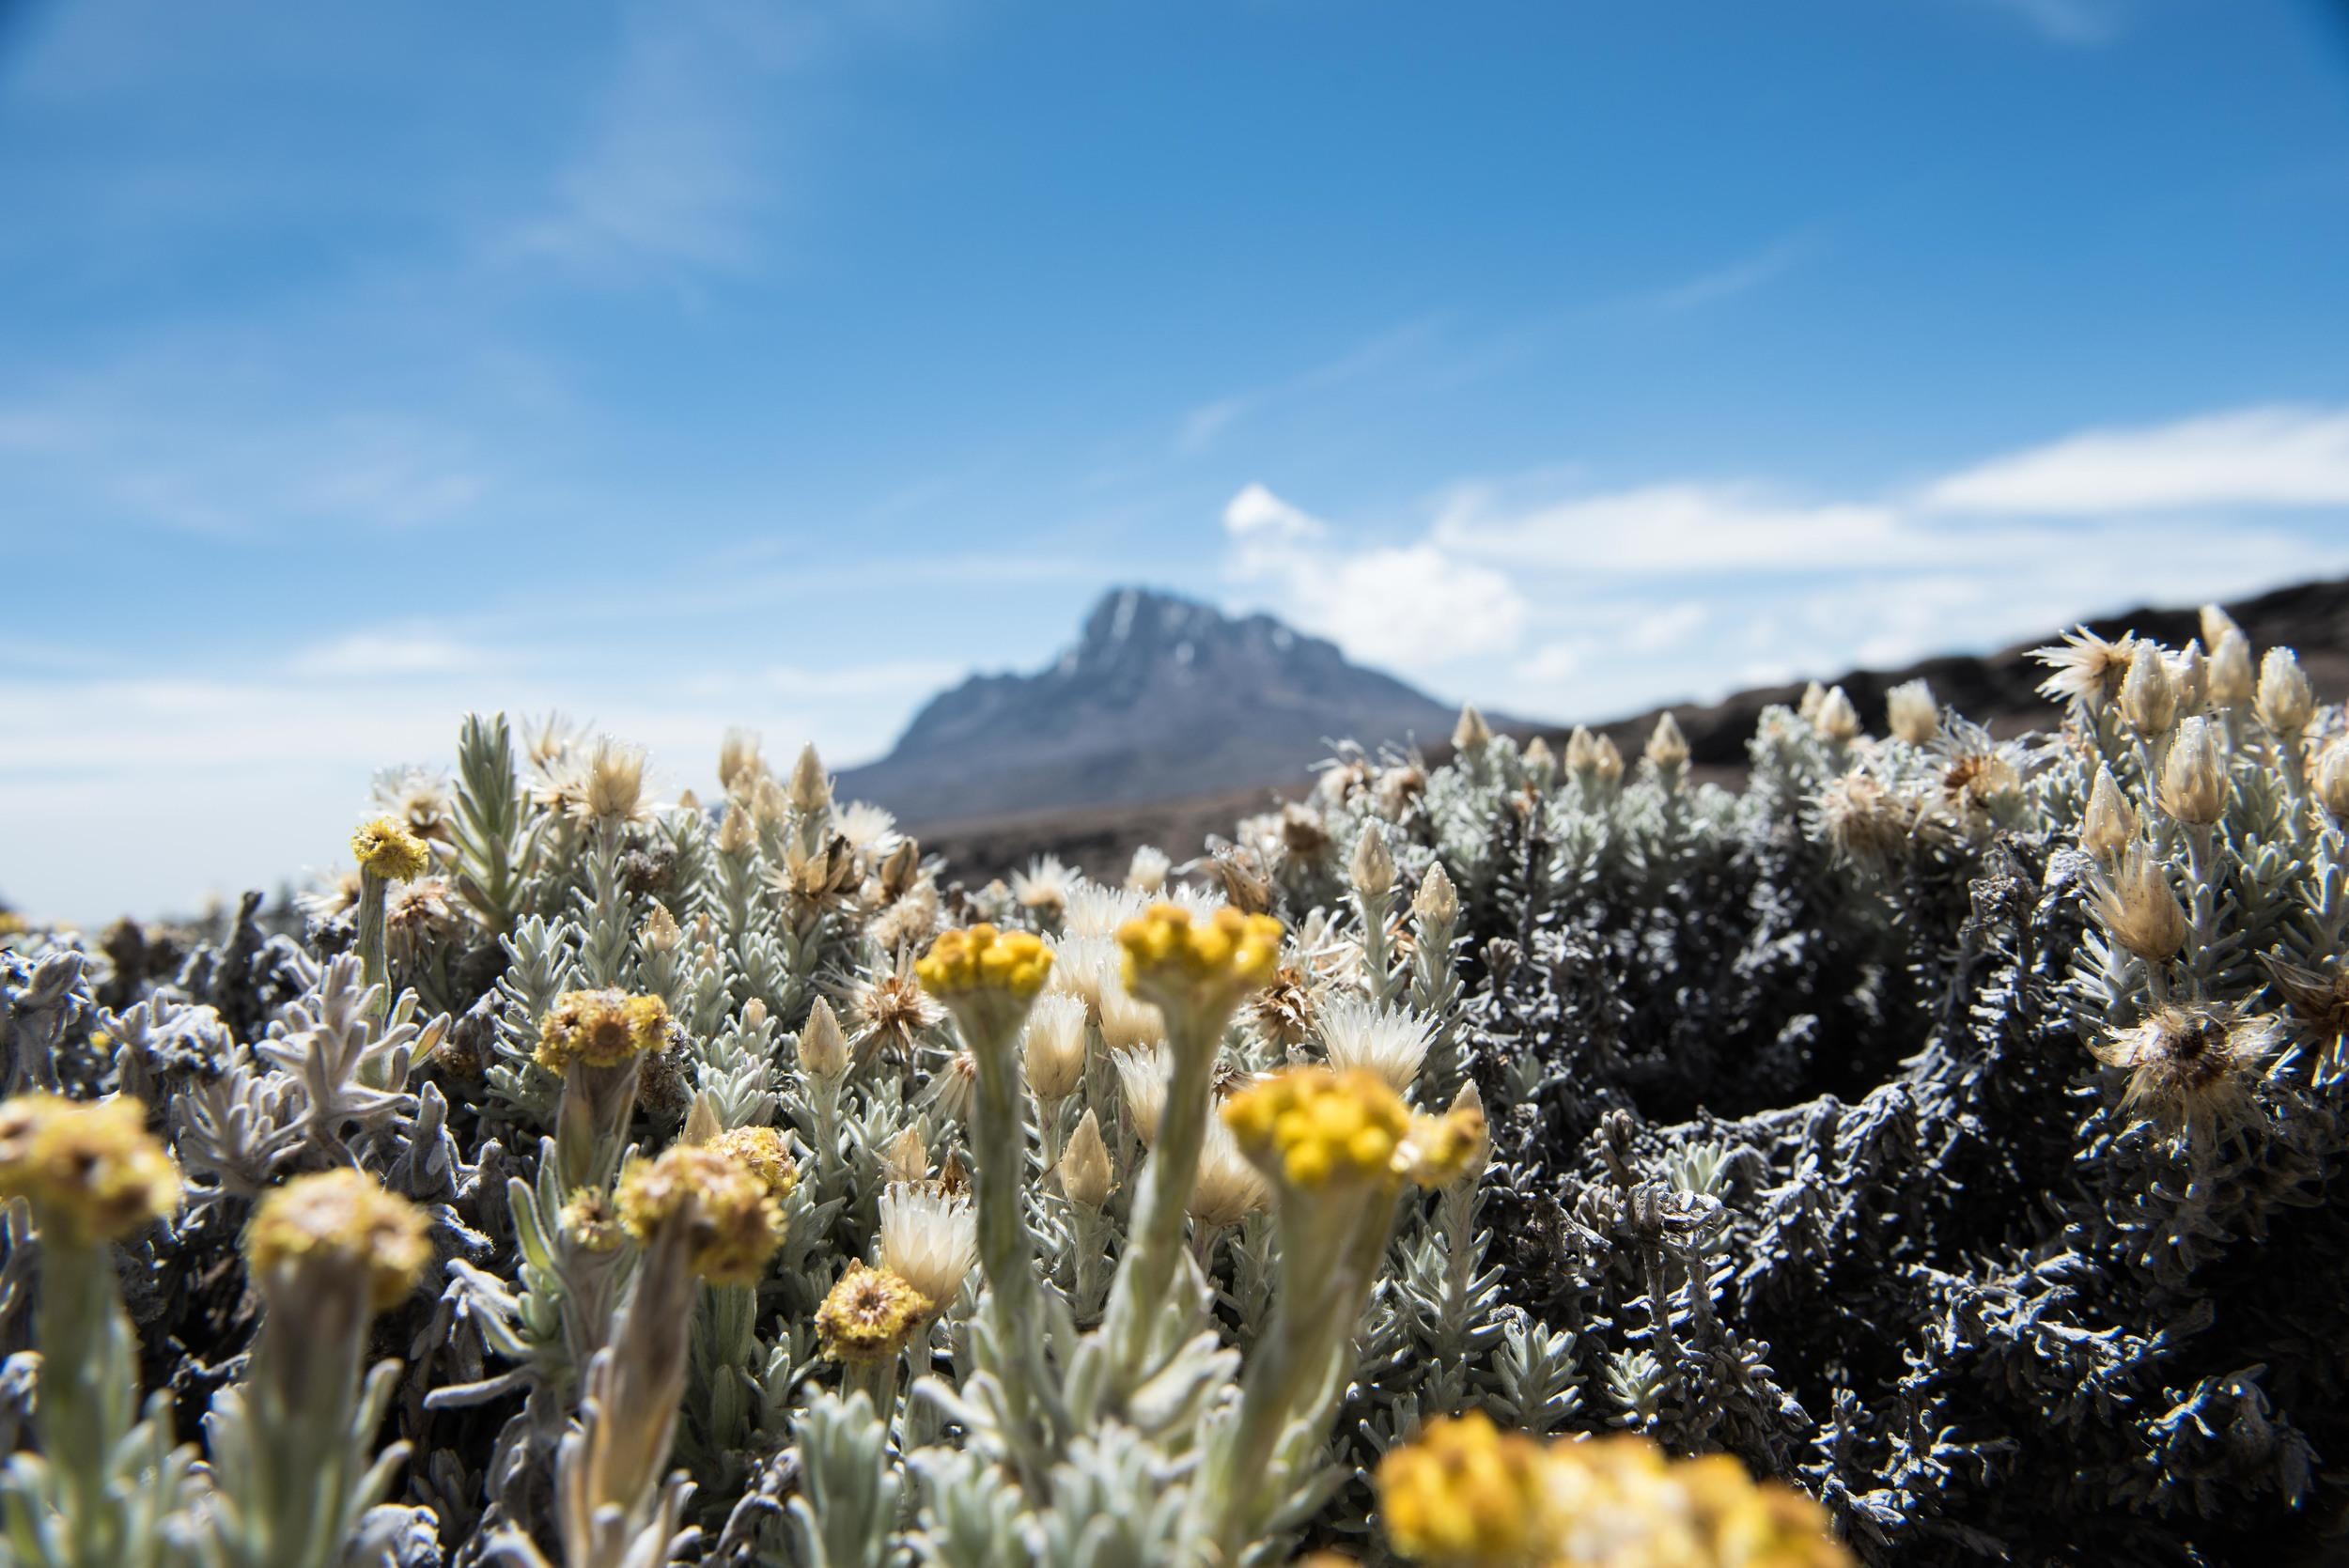 WEB_Kilimanjaro-22.jpg